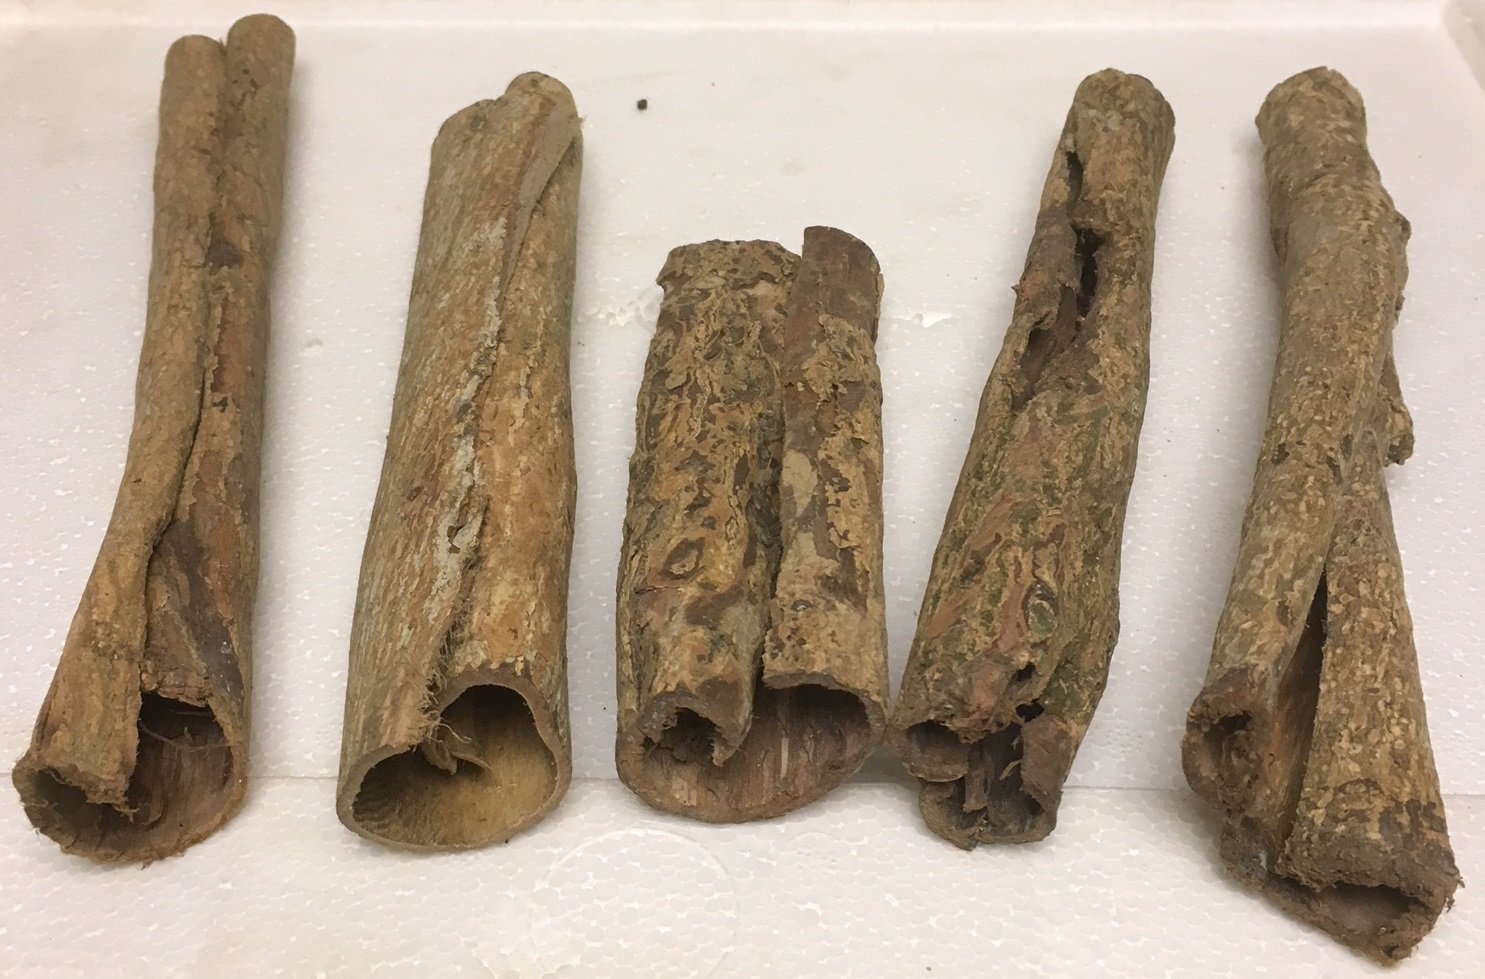 Diameter 3 cm x 12 cm Catappa Barks Cave//Tube - Catfish Lair Tubes Indian almond Tree Bark Tubes Caves Bonus Action